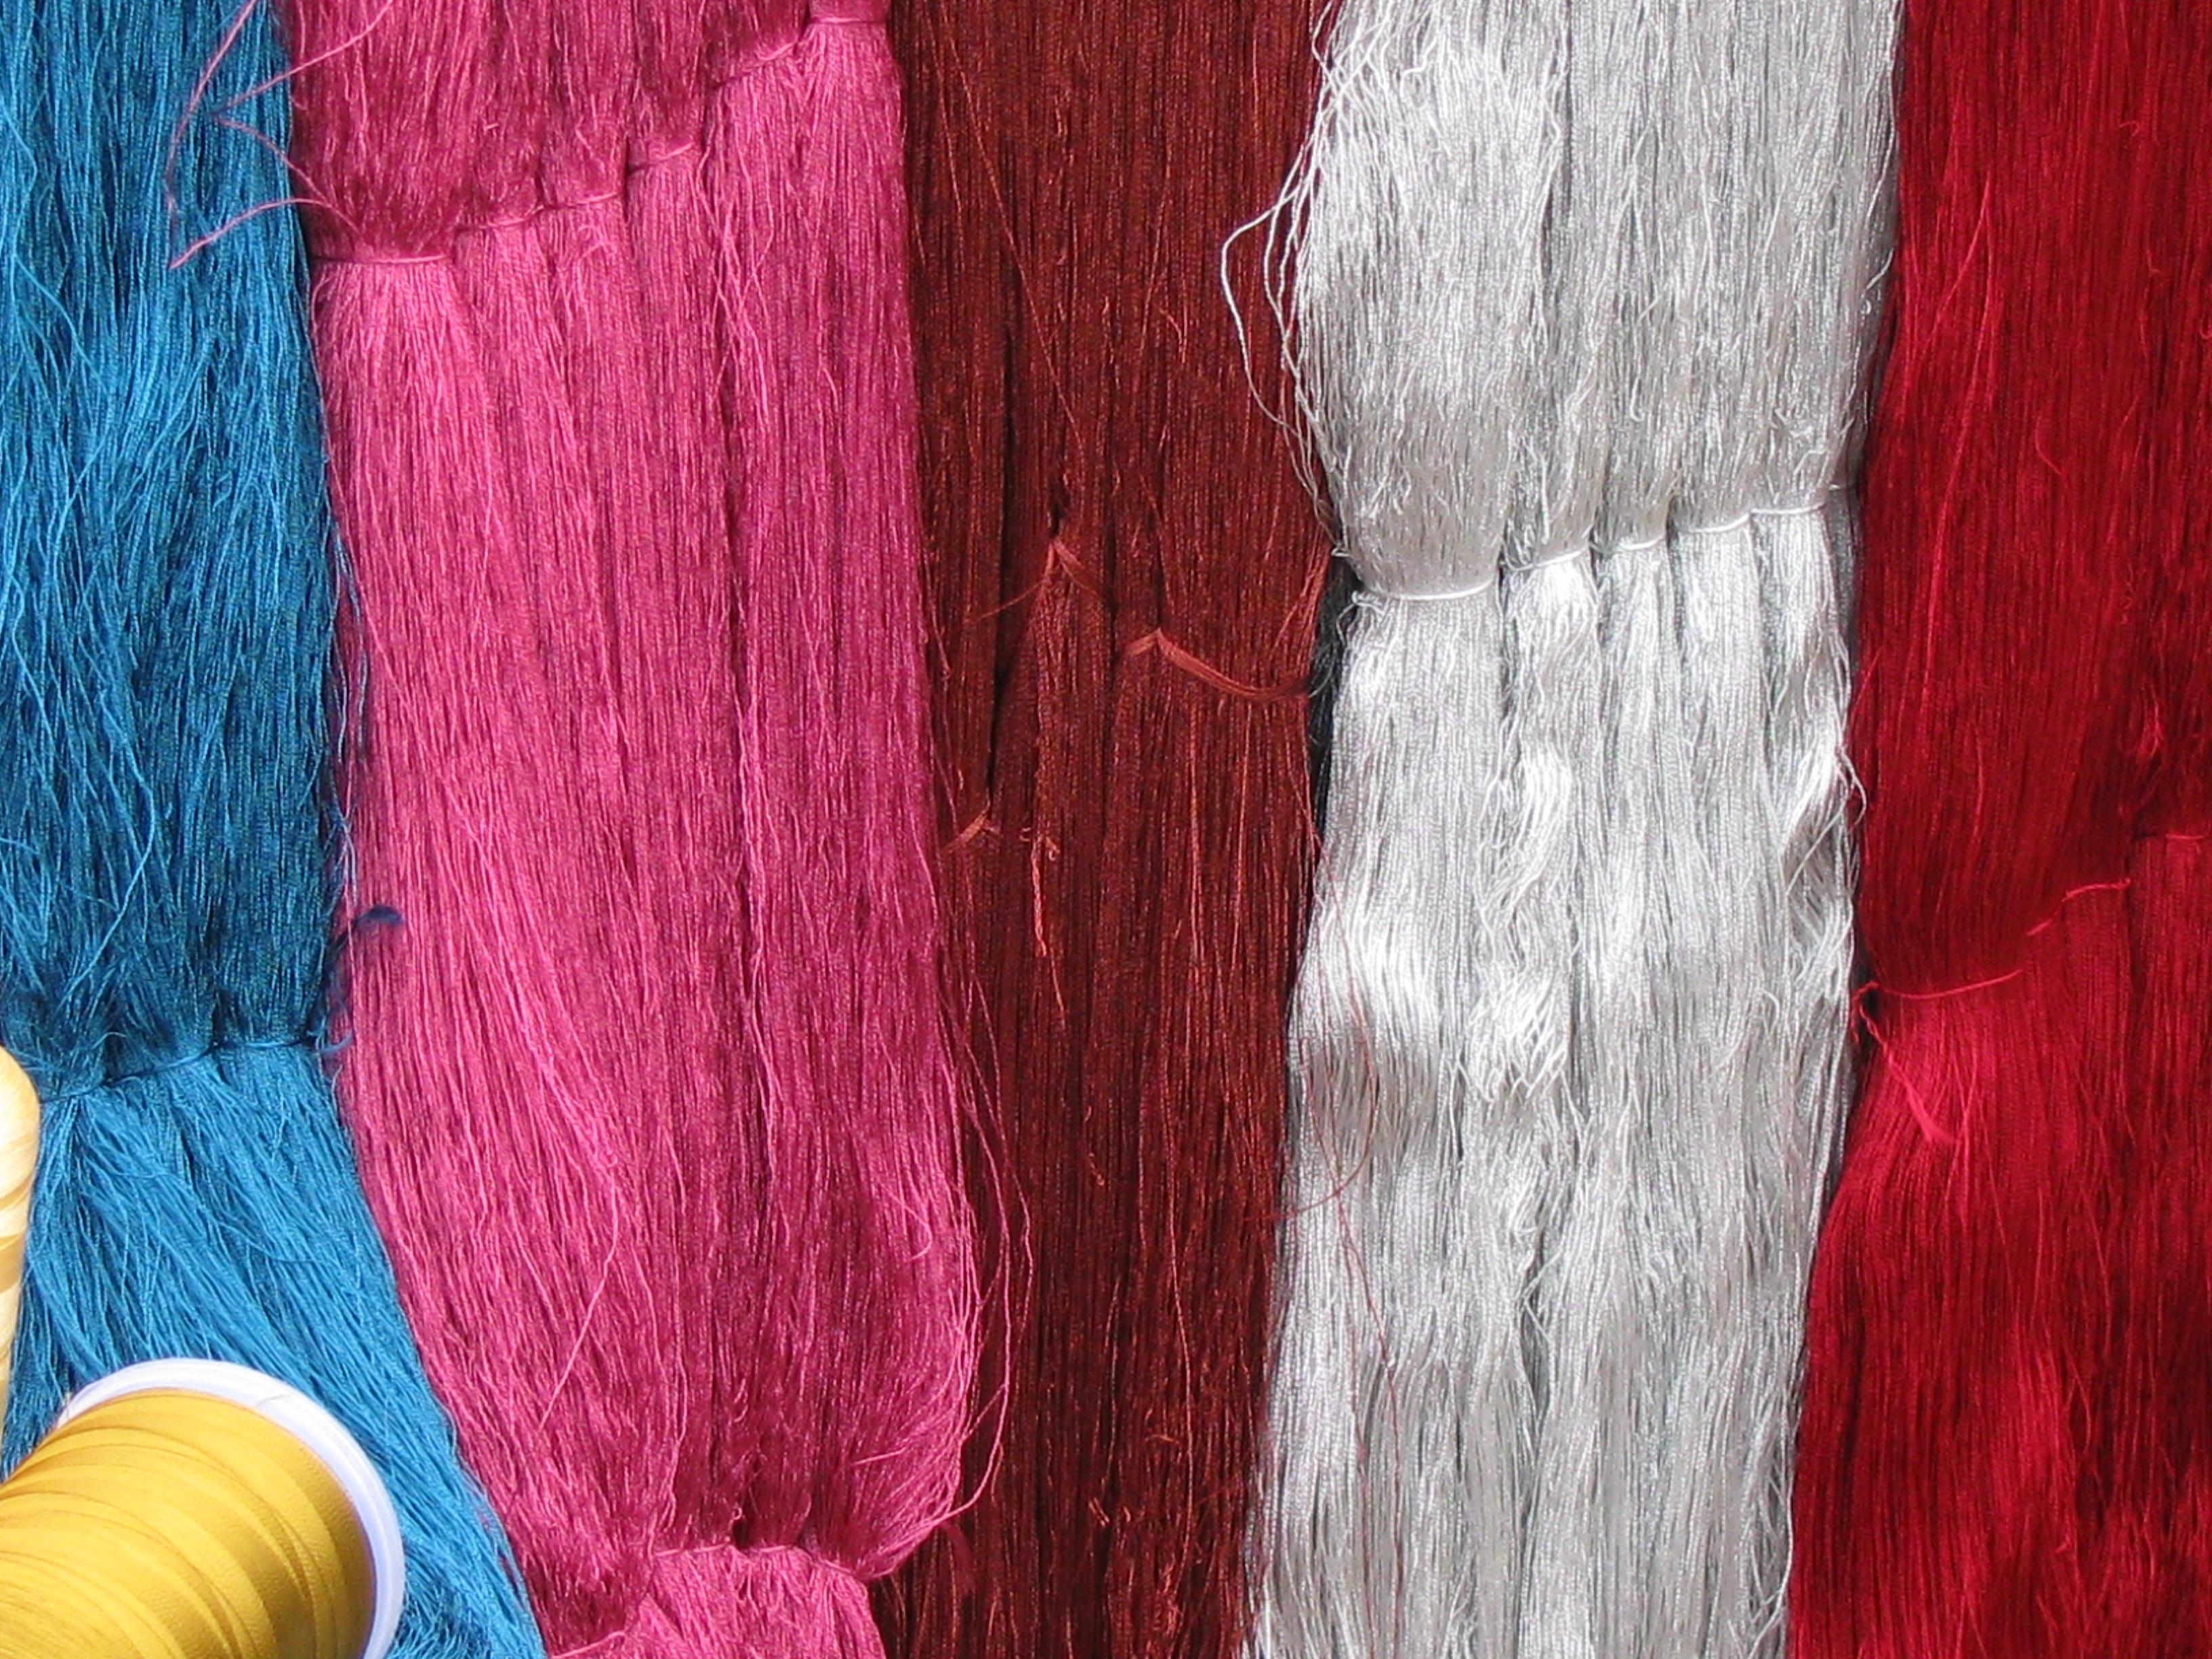 Viscose Rayon Embroidery Yarn On Hank (120d/2 Hank)